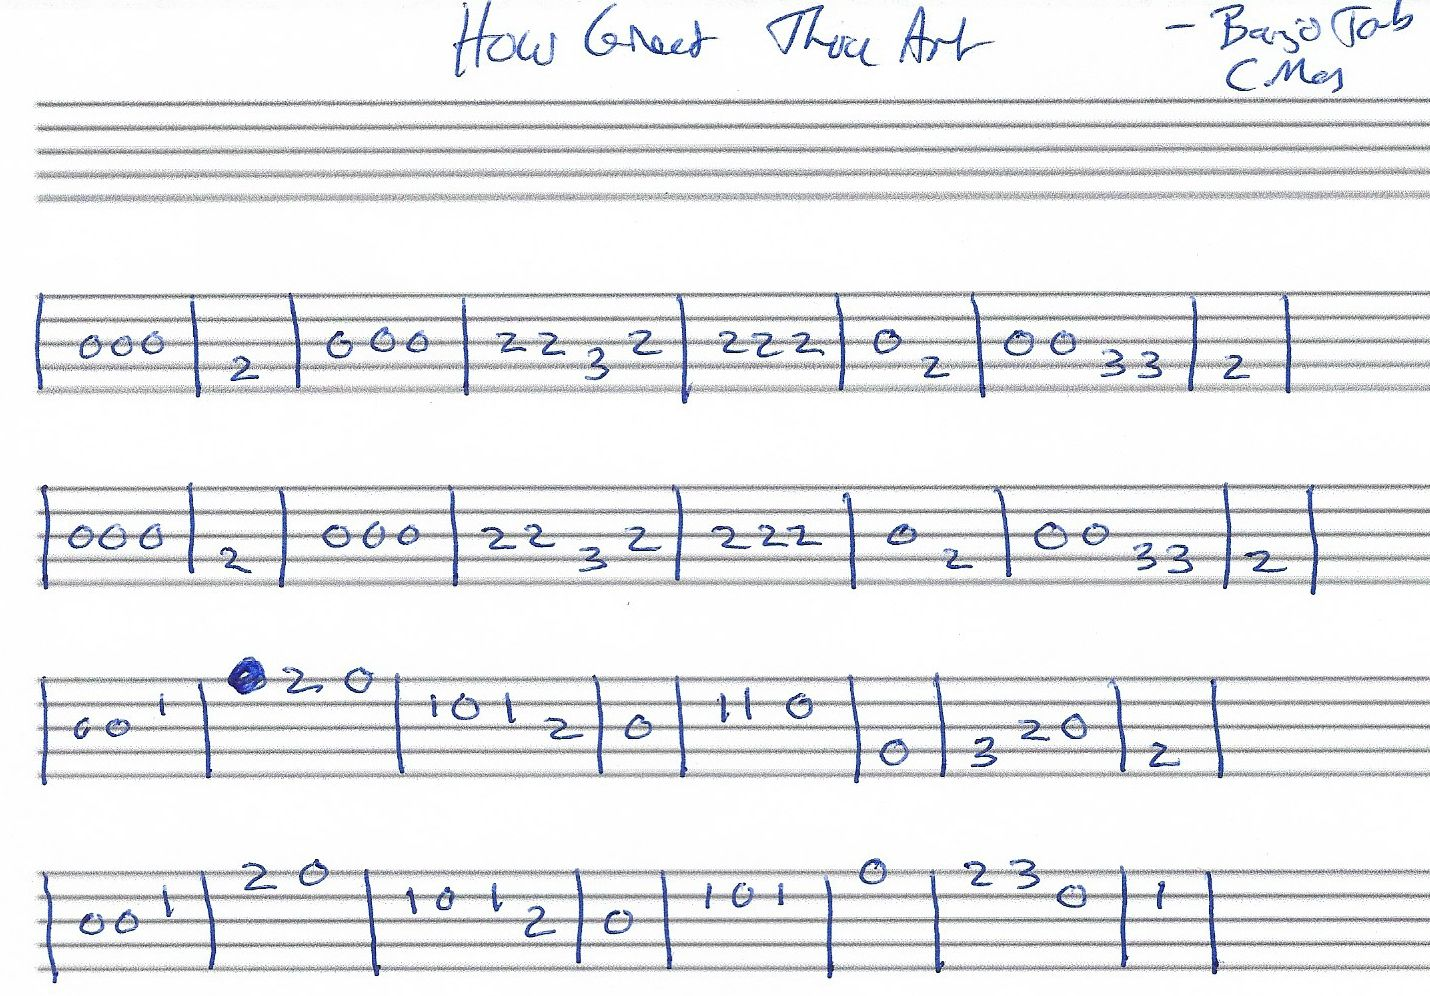 How great thou art banjo tab c major banjo tabs